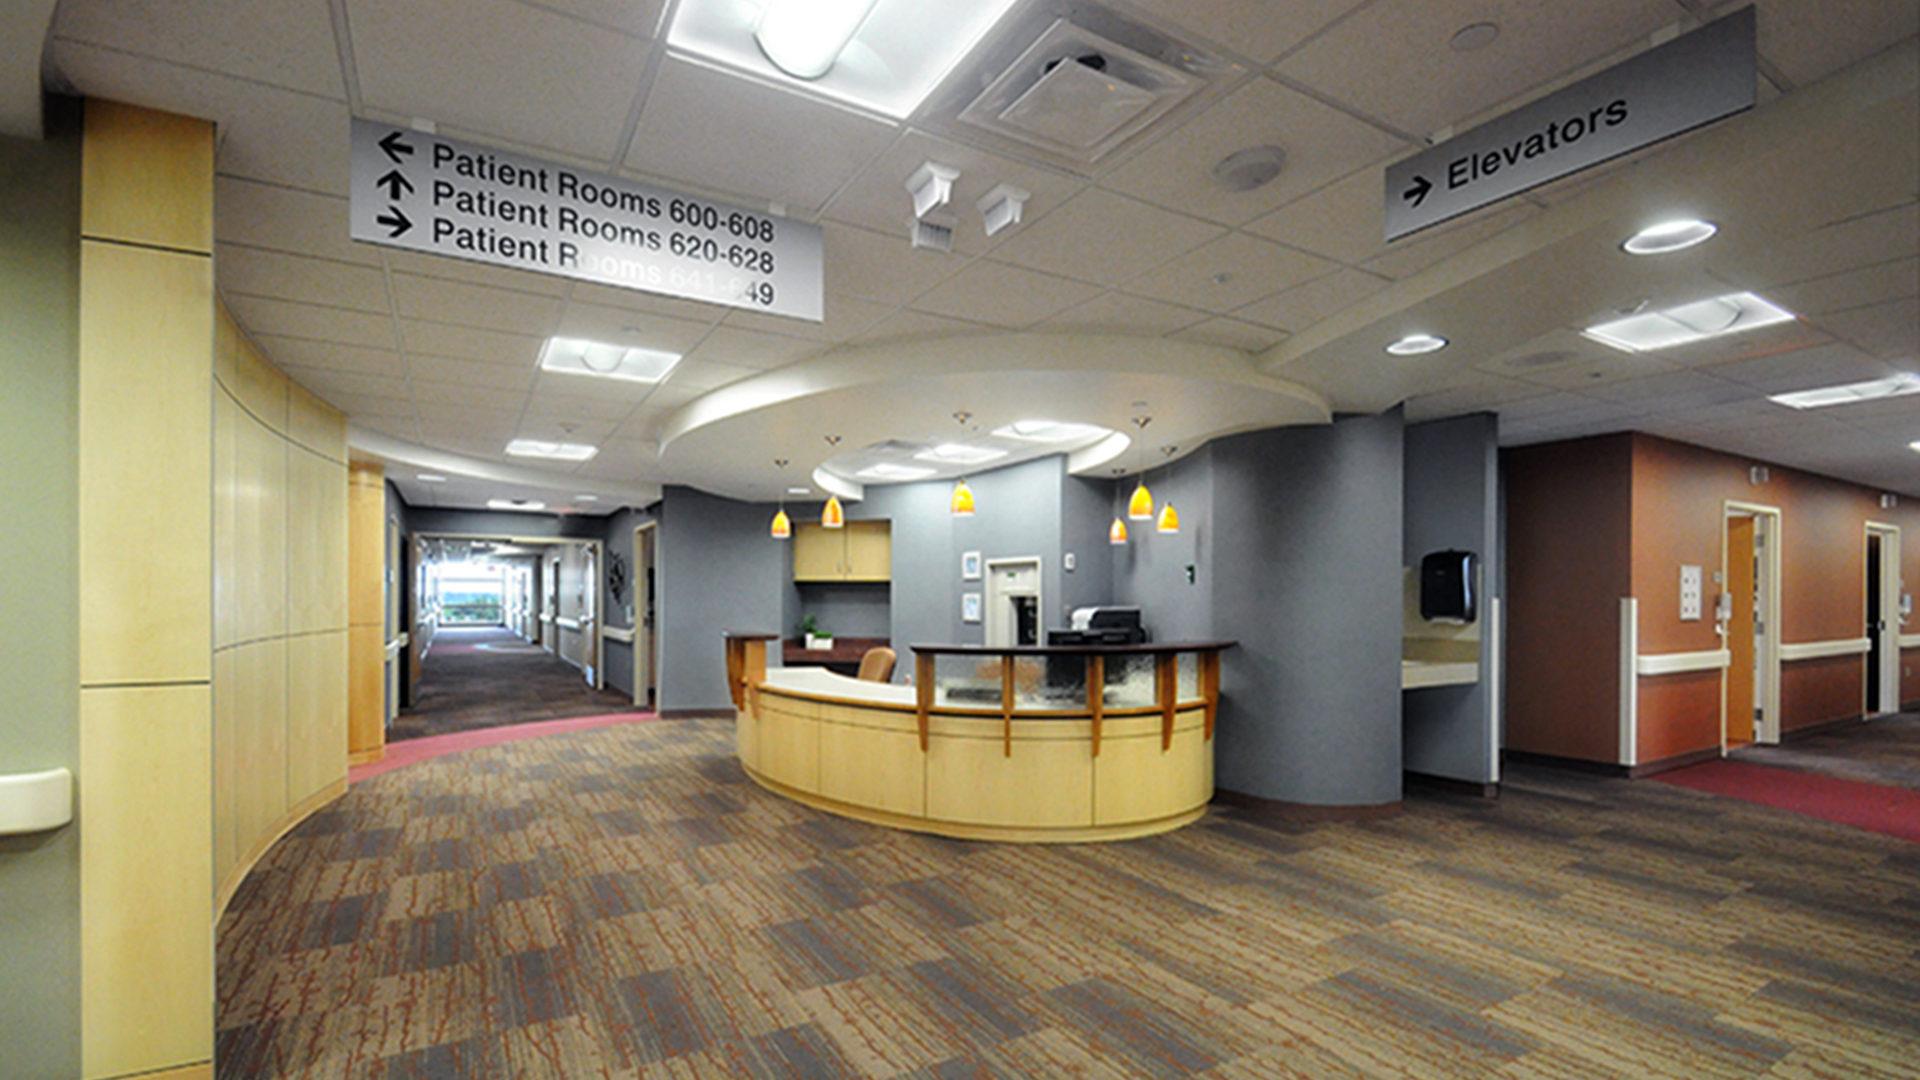 Fairview Ridges Hospital Addition and Renovations Burnsville Sixth Floor Nurses station and Corridor